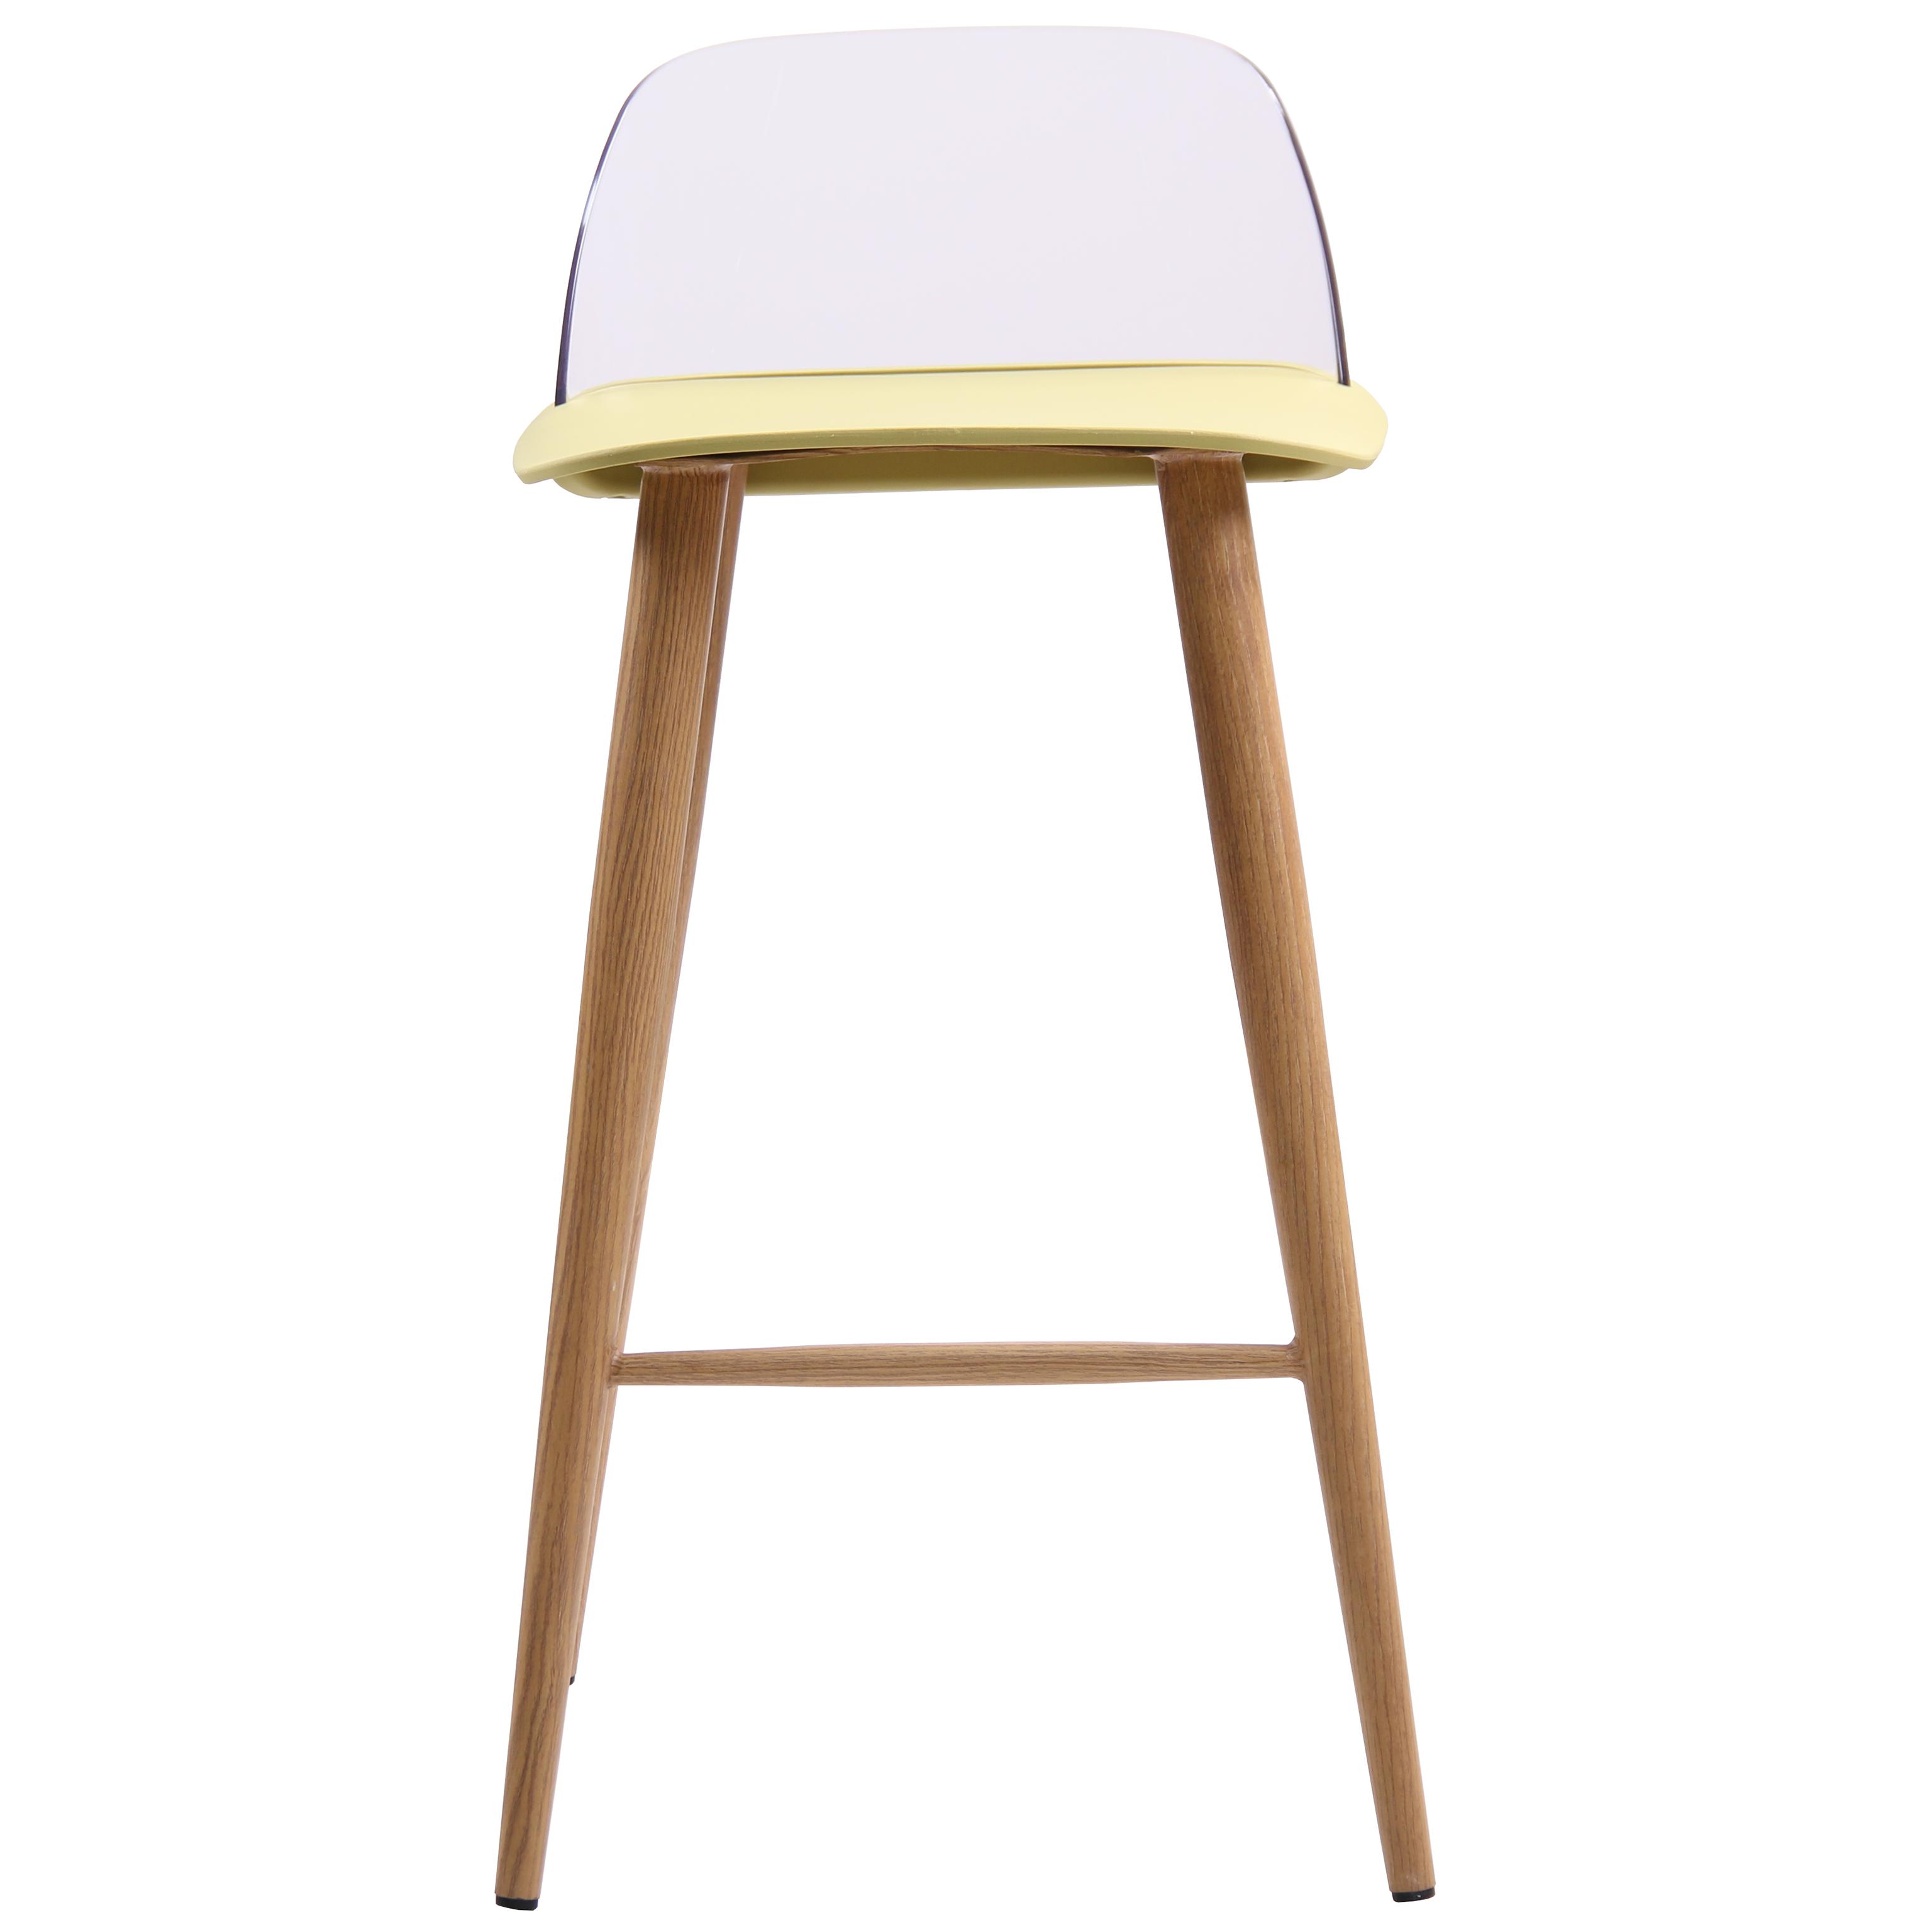 Green Kitchen Stools: 2x Oak Kitchen Breakfast Bar Stool Seat Barstool